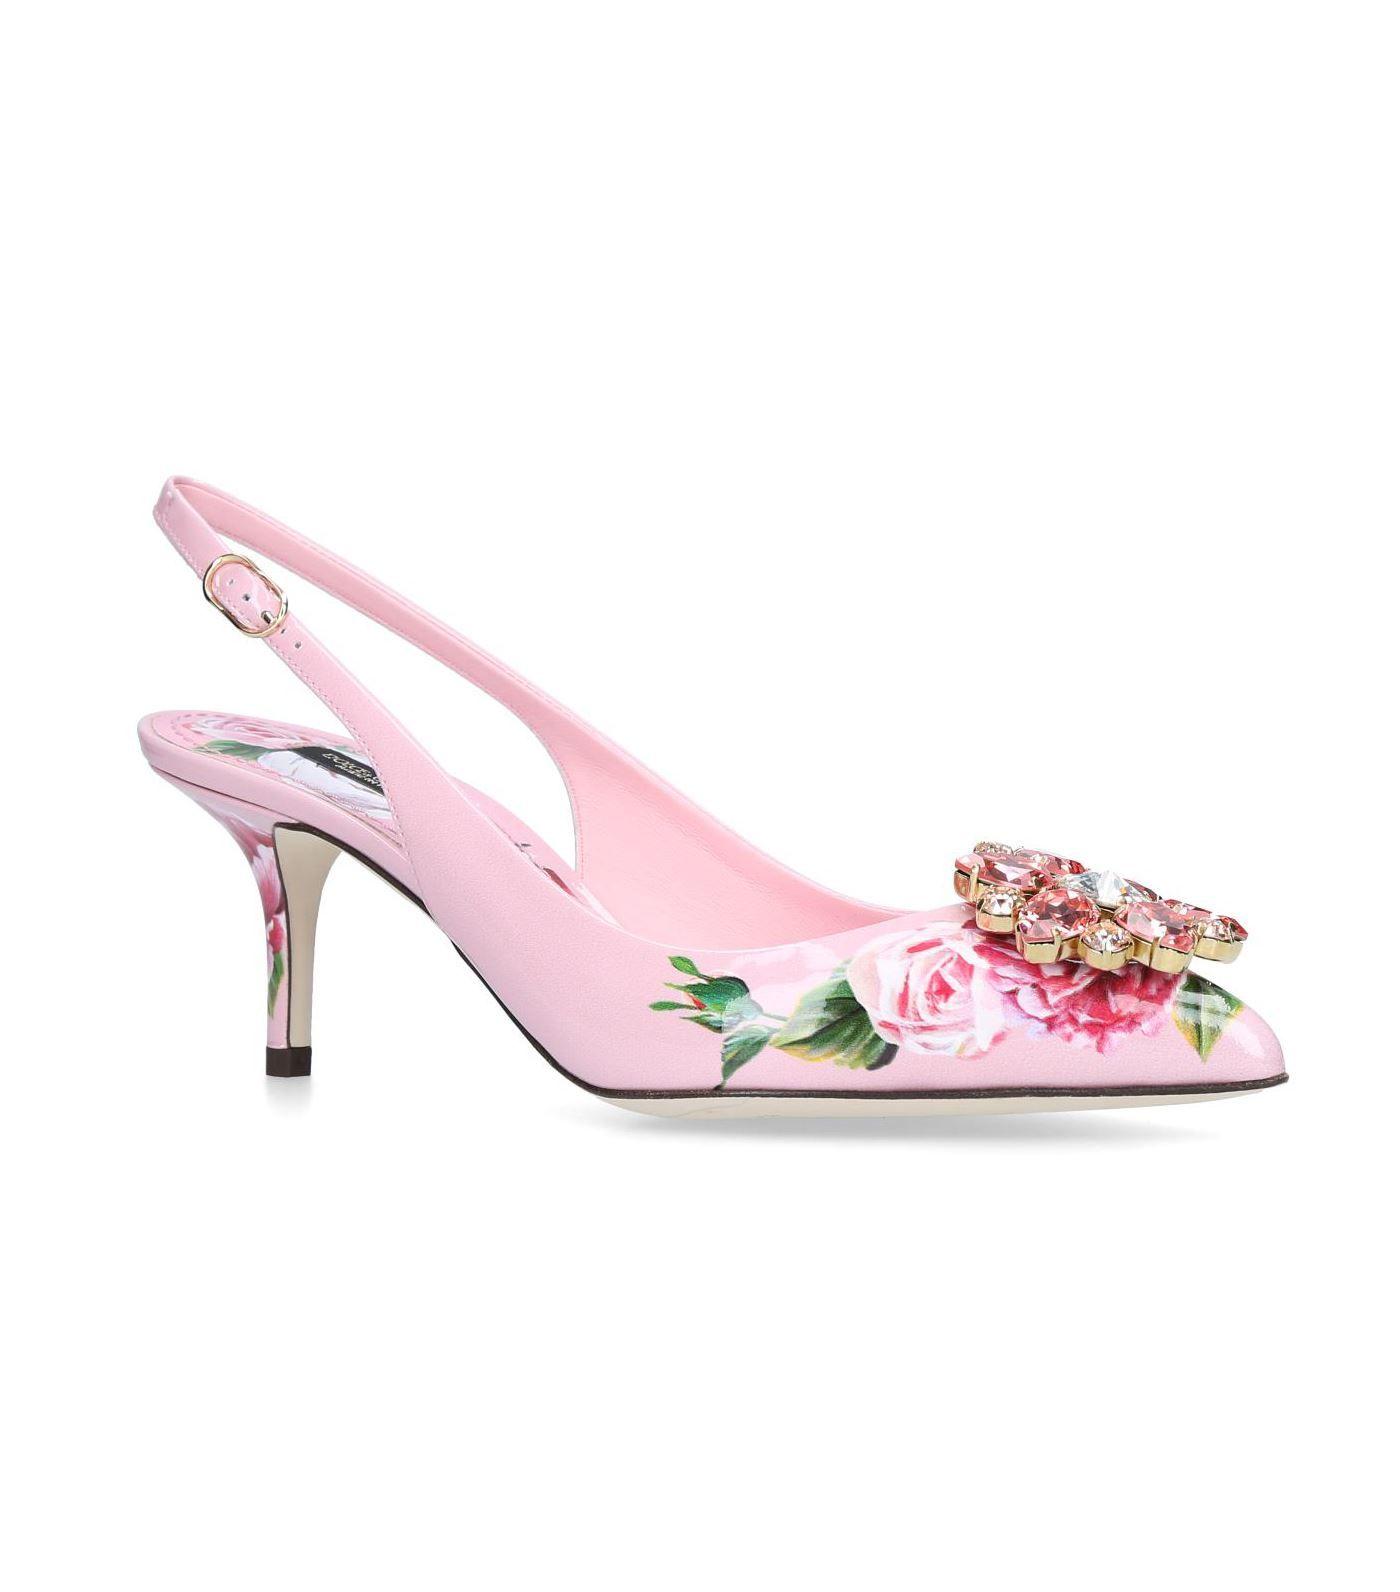 778e41e10e86 DOLCE   GABBANA EMBELLISHED MAIOLICA BROCCATO SLINGBACK PUMPS 60.   dolcegabbana  shoes